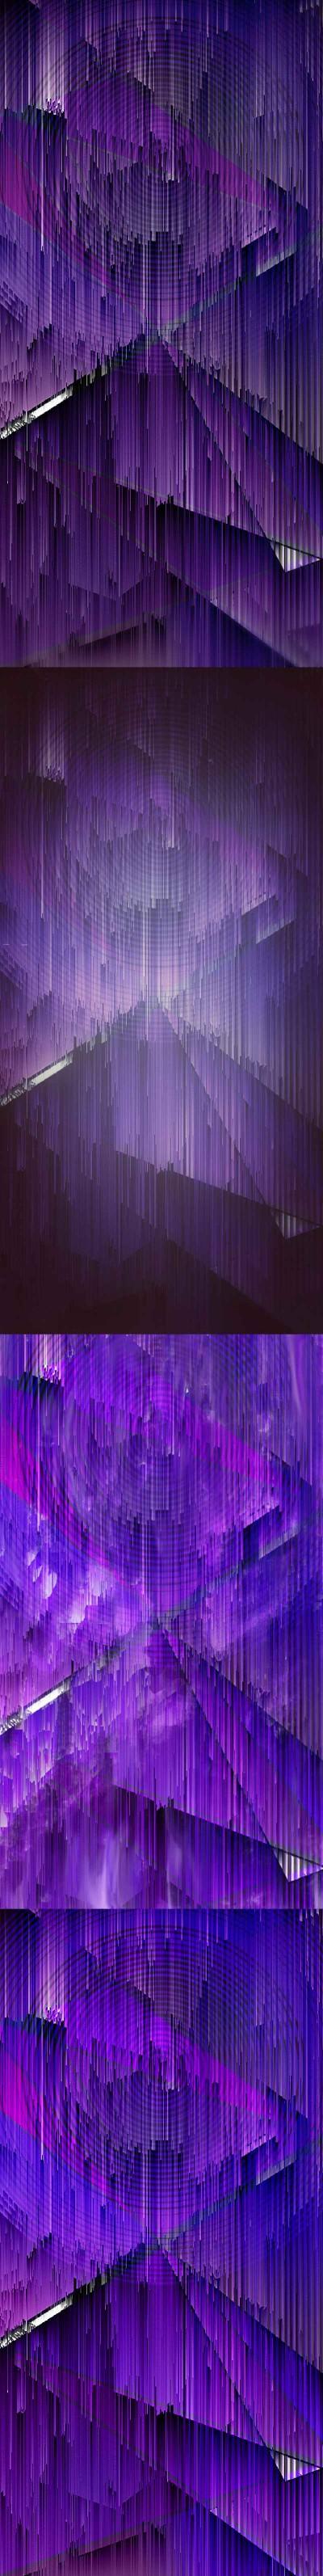 Purple Pixel Pushers | Danny.Cas.io | Digital Drawing | PENUP